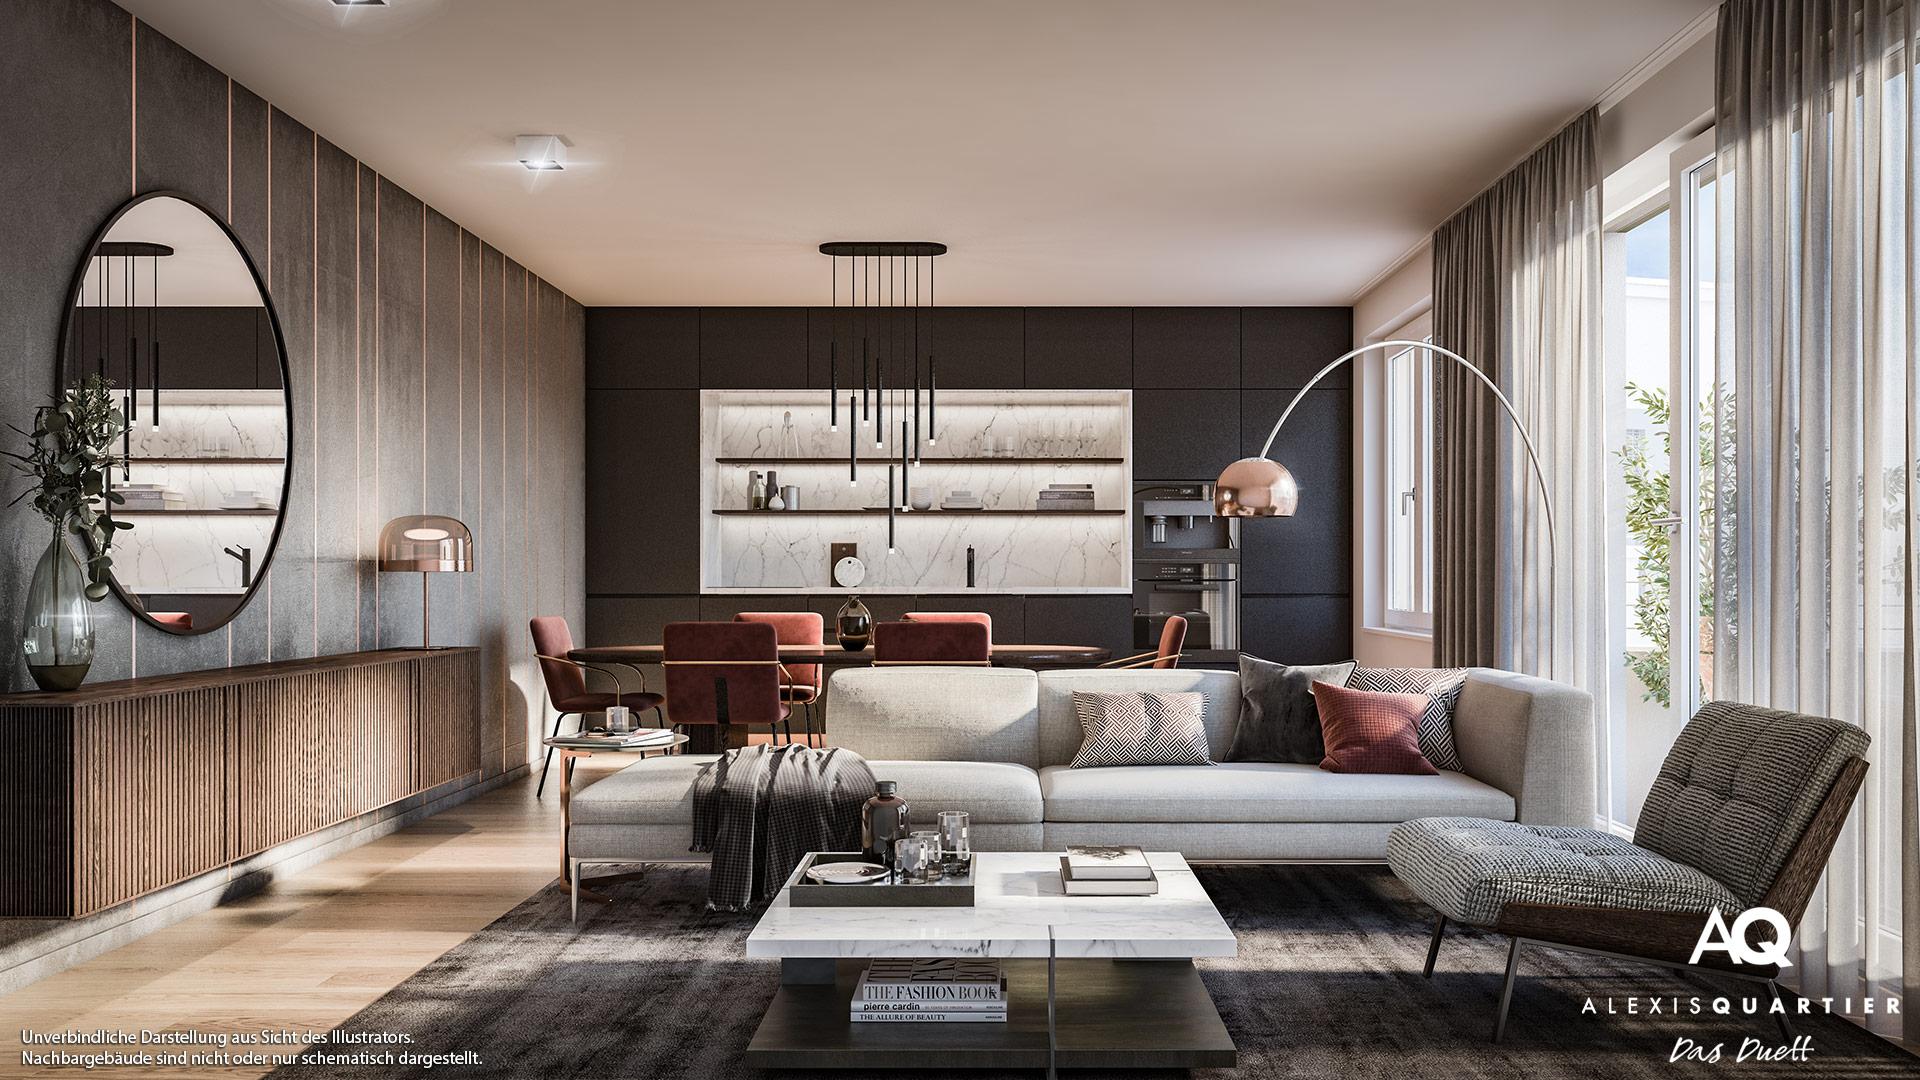 Immobilie Alexisquartier - Das Duett - Illustration 7